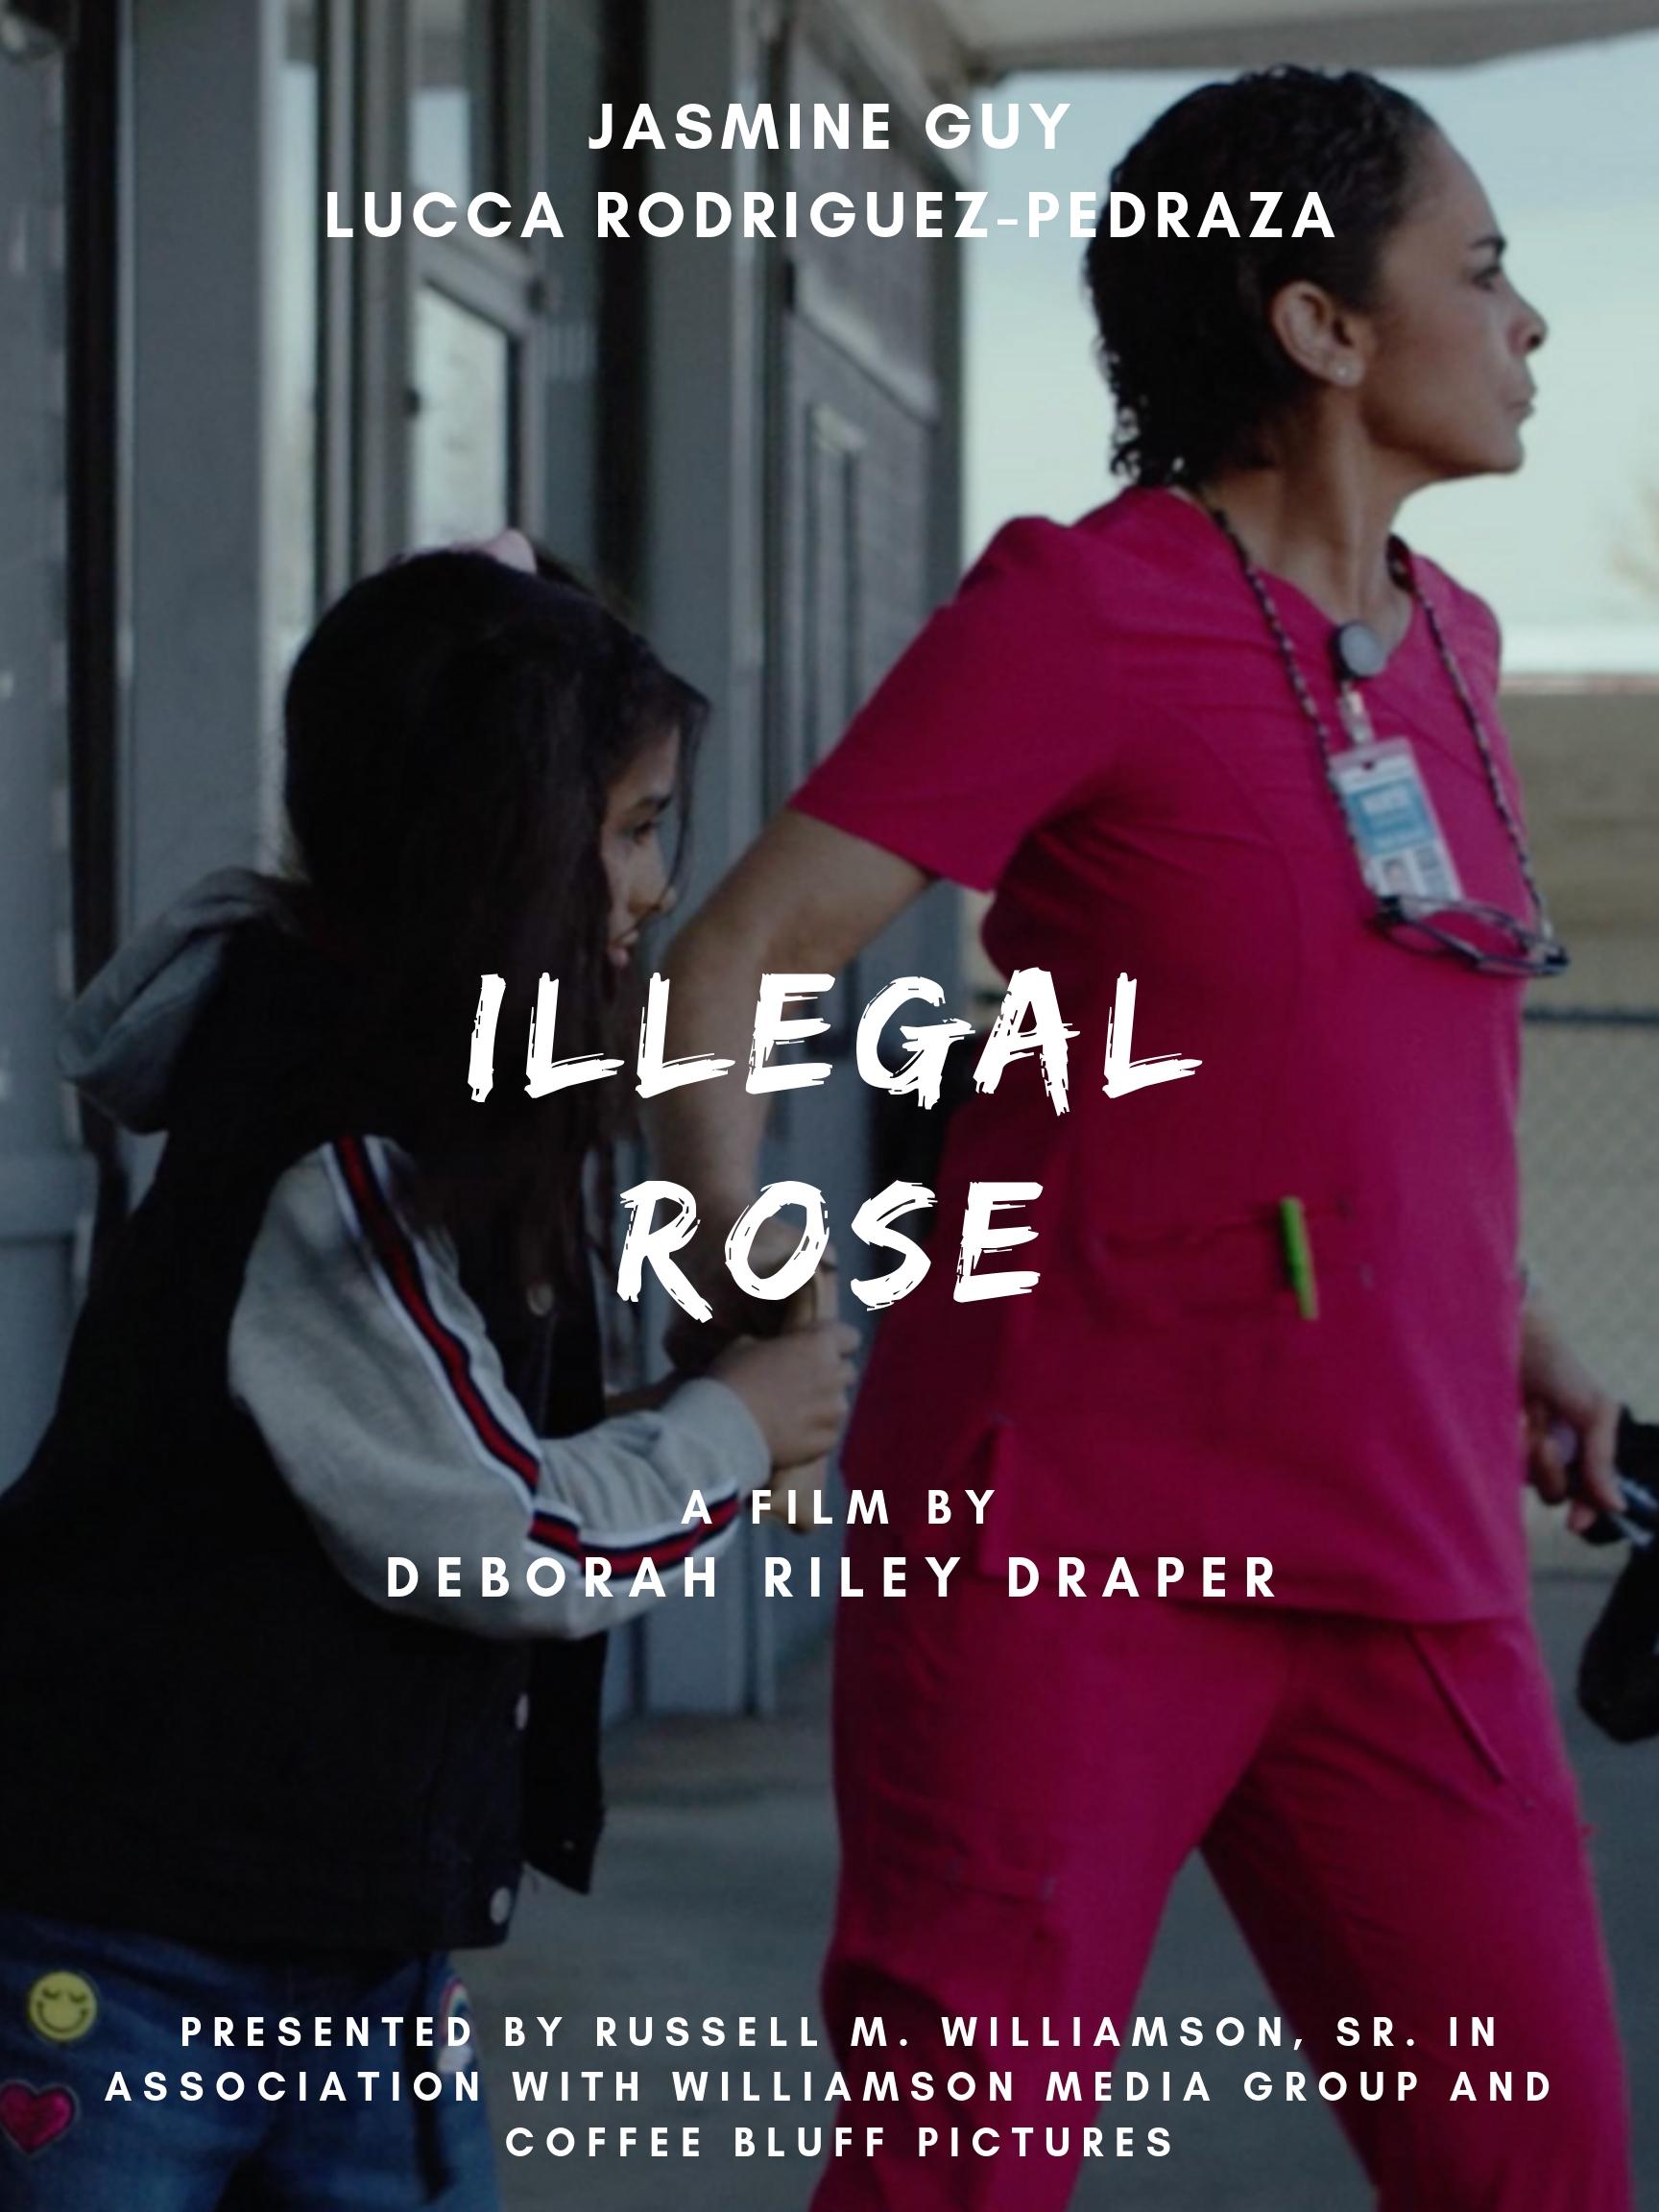 https://bffno.com/wp-content/uploads/2021/03/Illegal-Rose.jpg